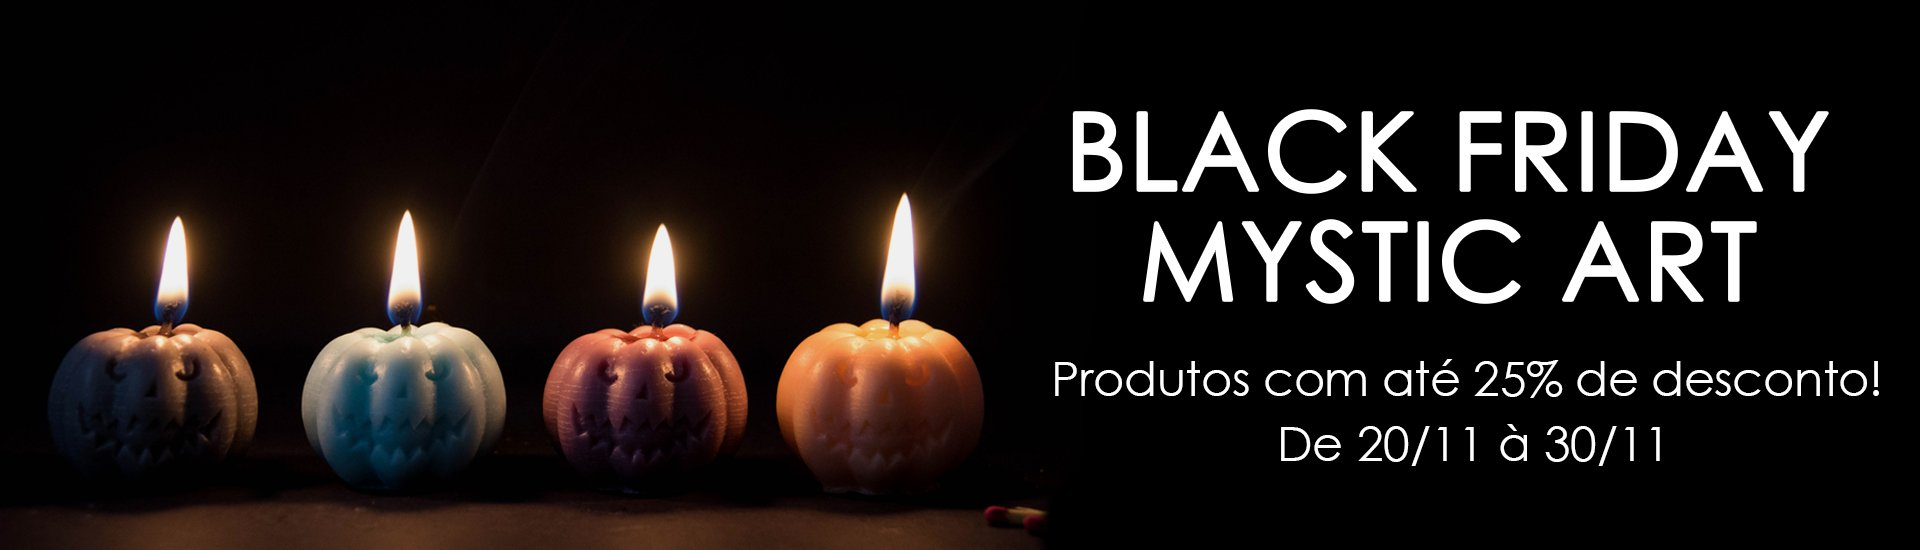 Black friday Mystic